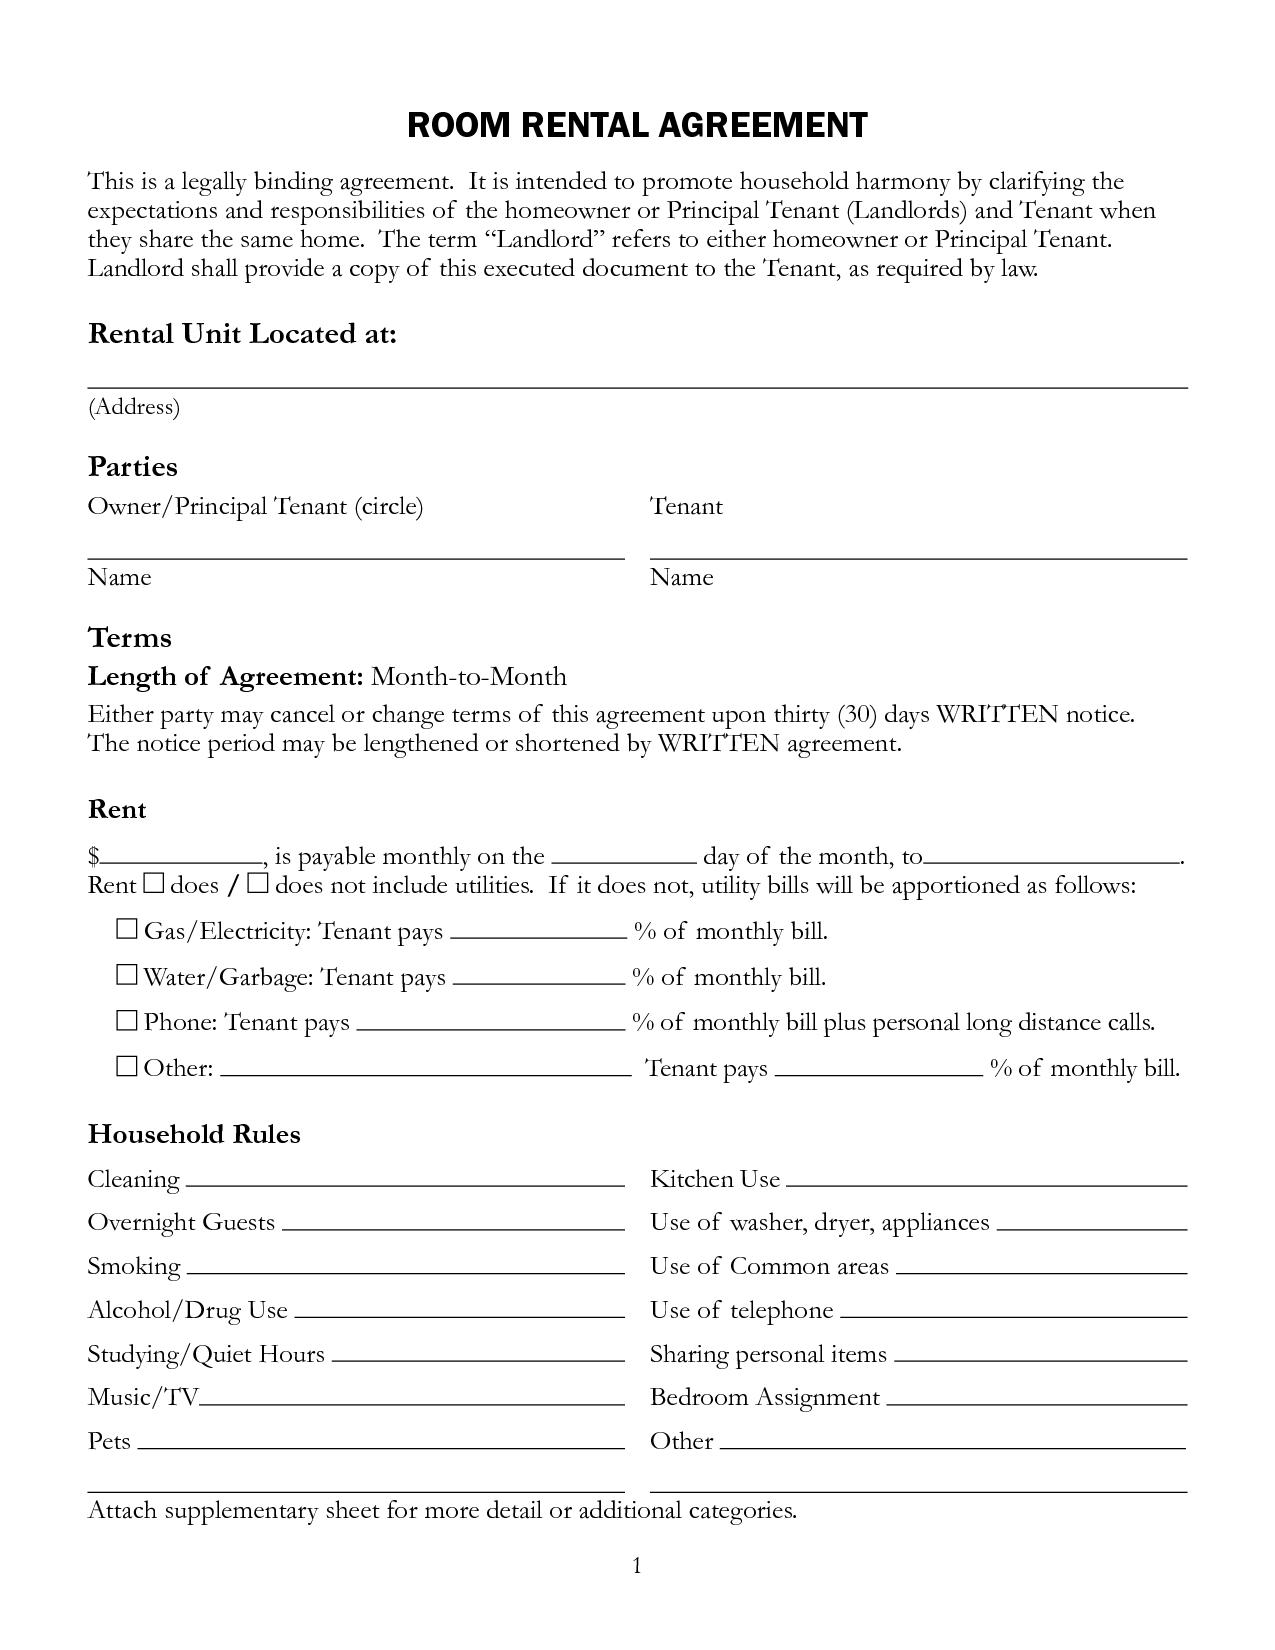 Rental Agreement Template Free Printable Documents Room Rental Agreement Rental Agreement Templates Lease Agreement Free Printable